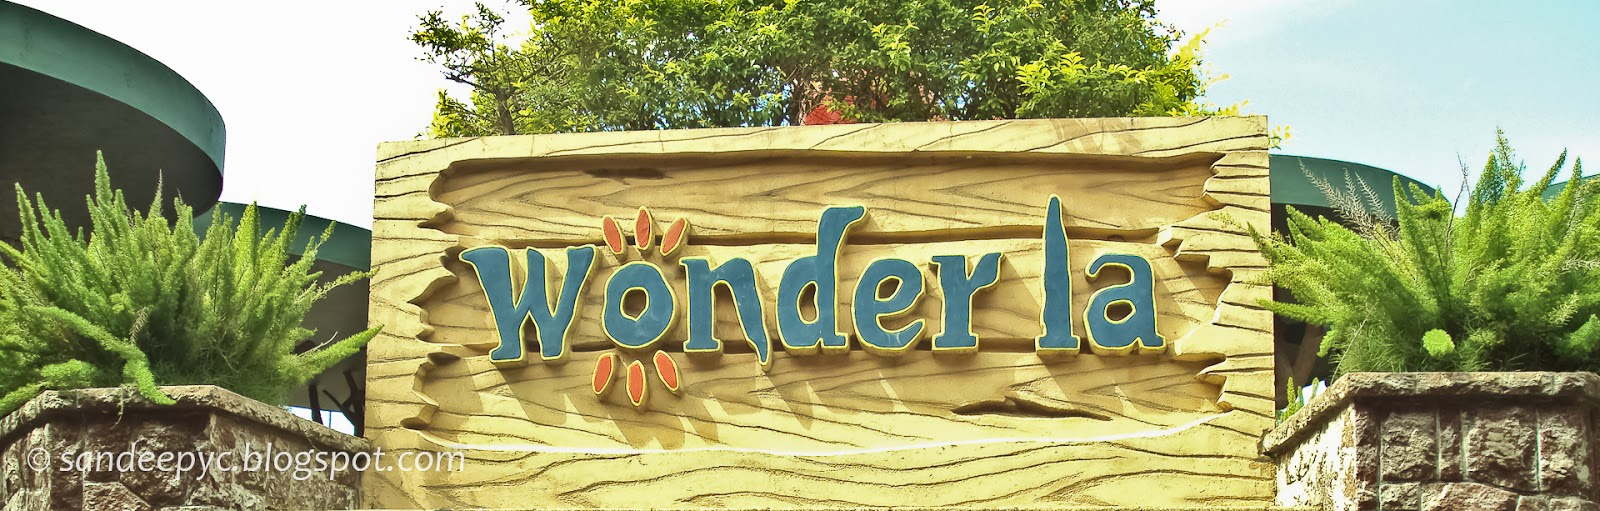 WonderLa entrance